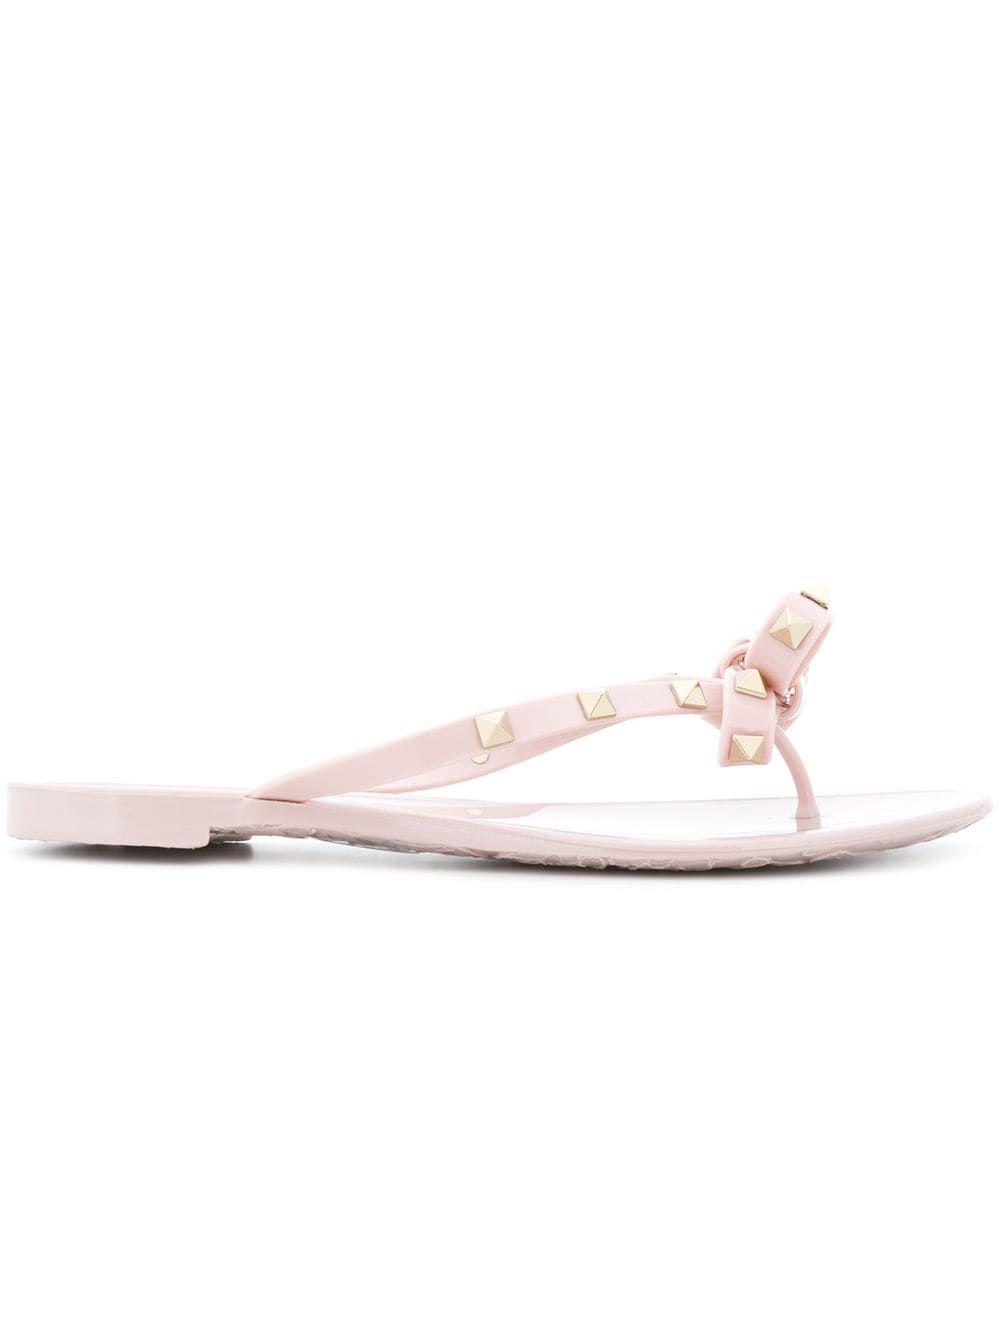 Sandalo infradito rockstud